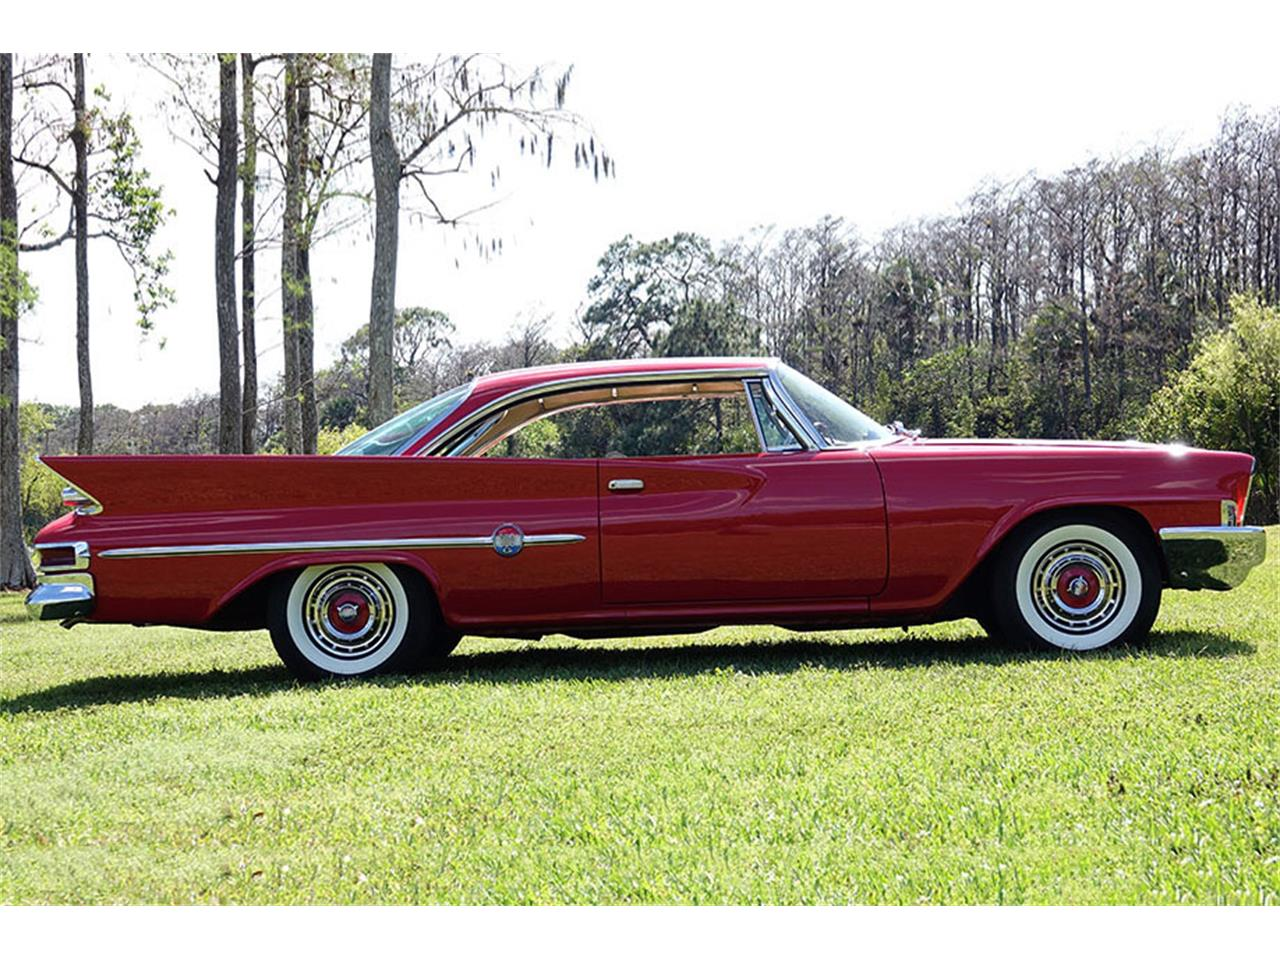 1961 Corvair Wiring Diagram Schematics 1959 Chrysler Schematic Diagrams Lincoln Harness Explore